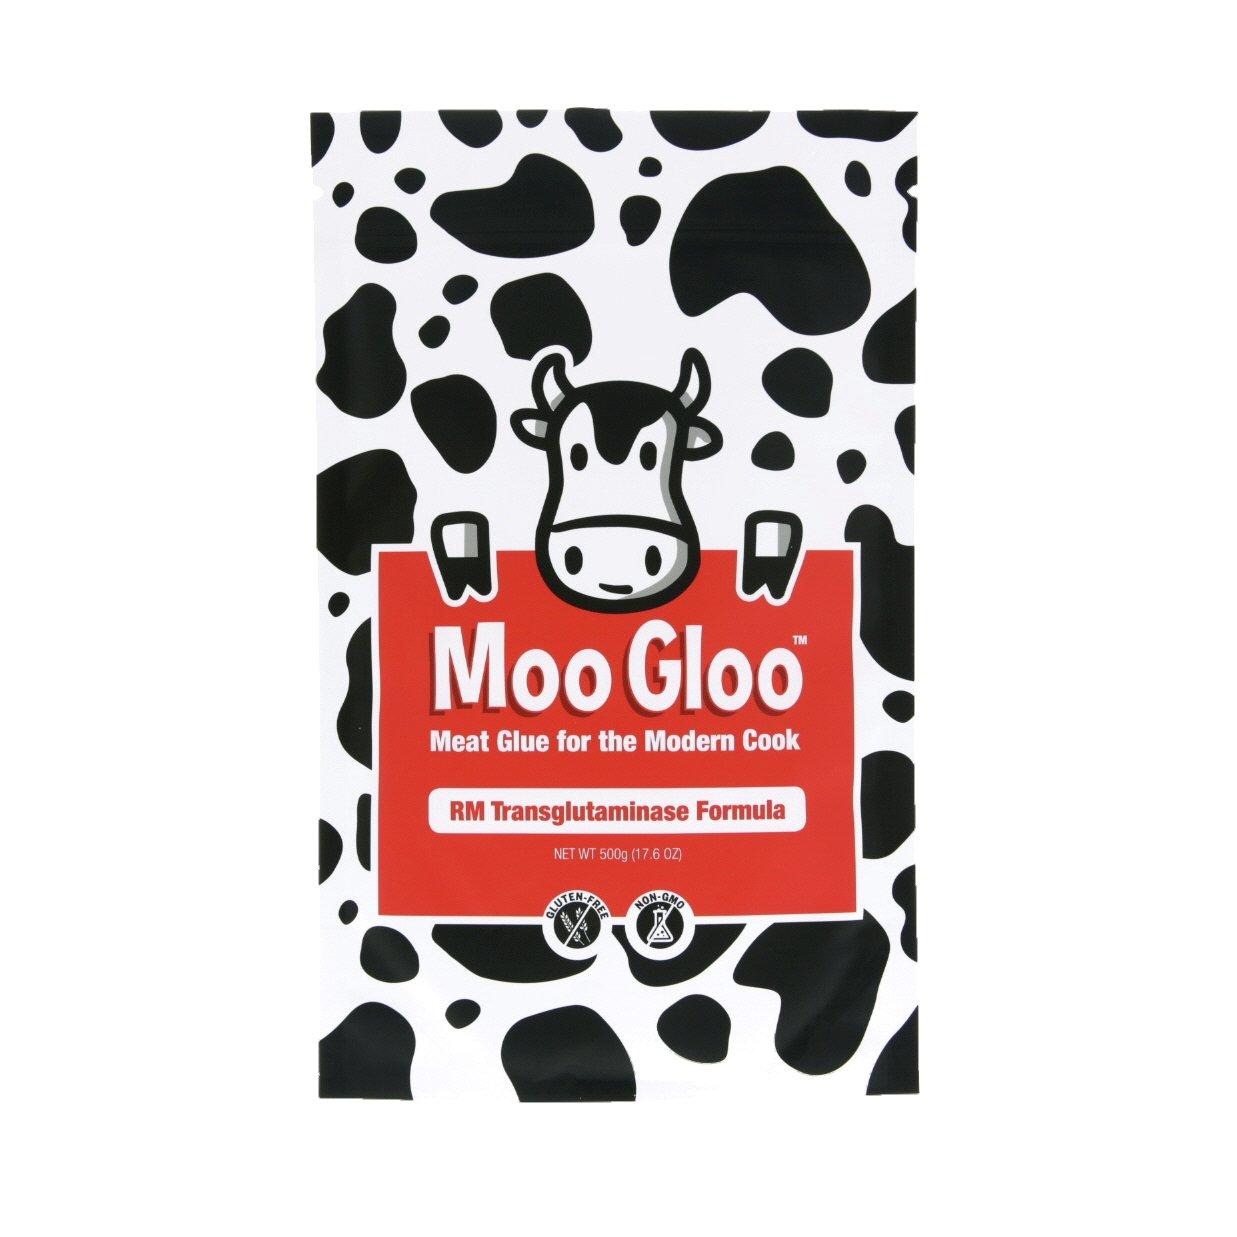 Transglutaminase (Meat Glue) - RM Formula, 500g/1.1lbs by Moo Gloo (Image #1)